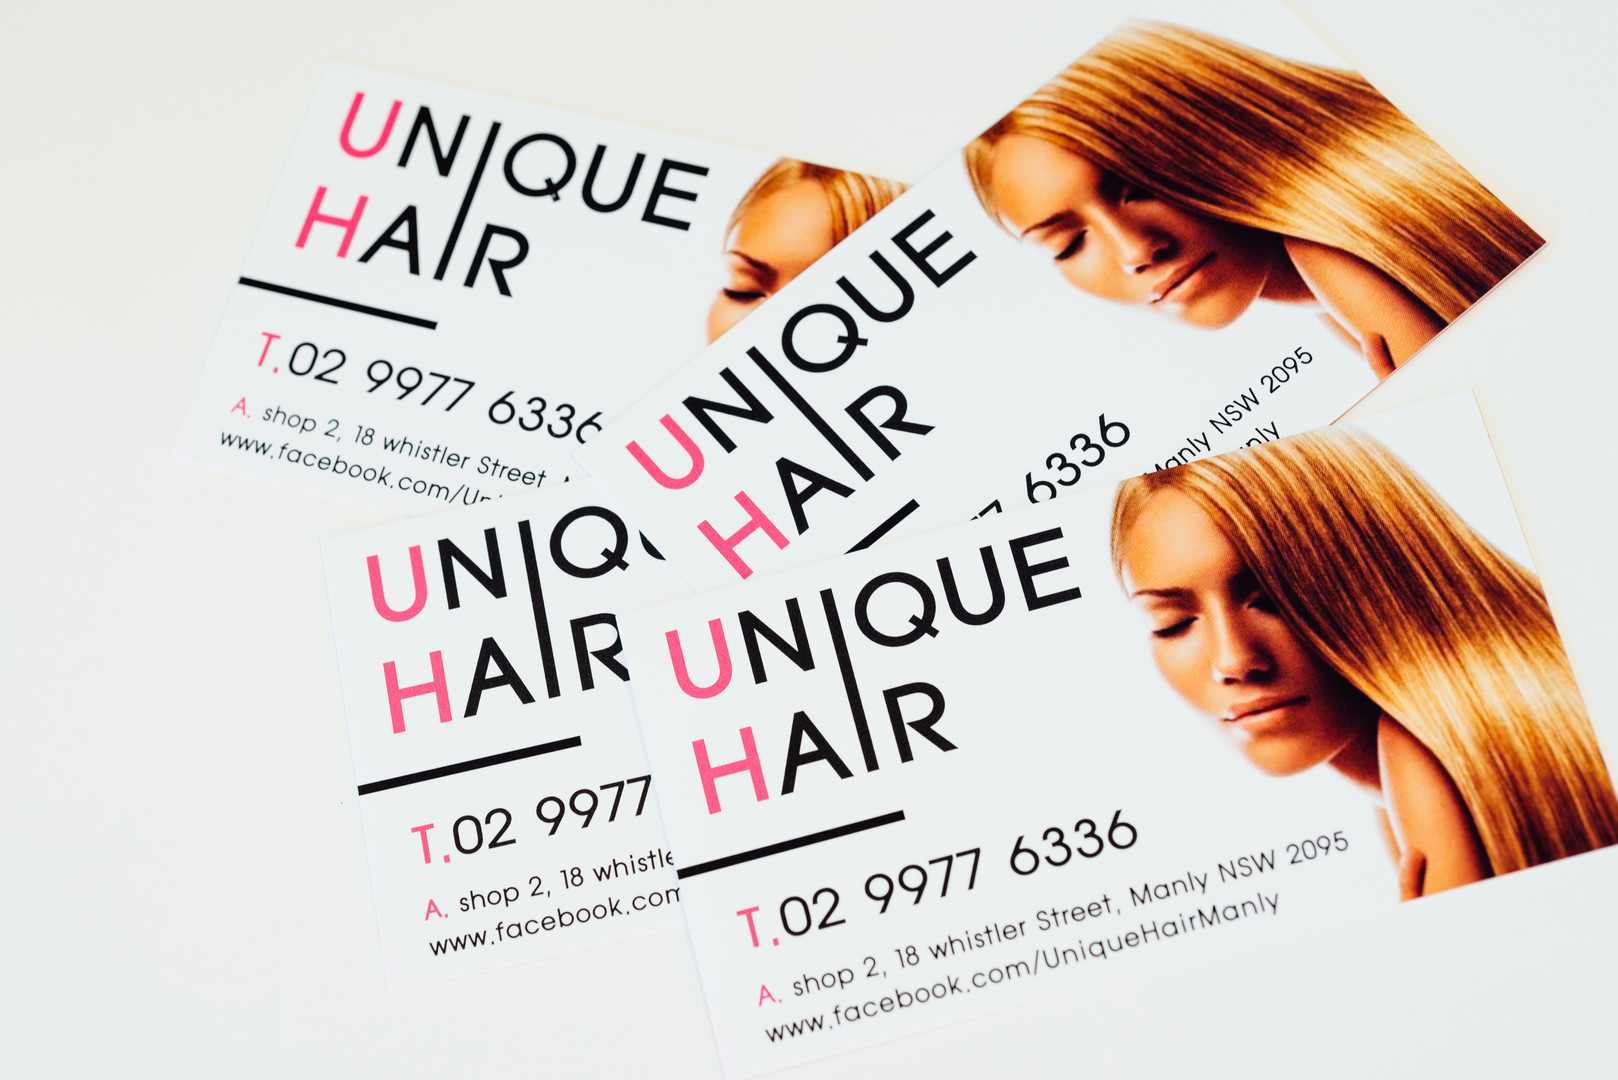 Unique Hair